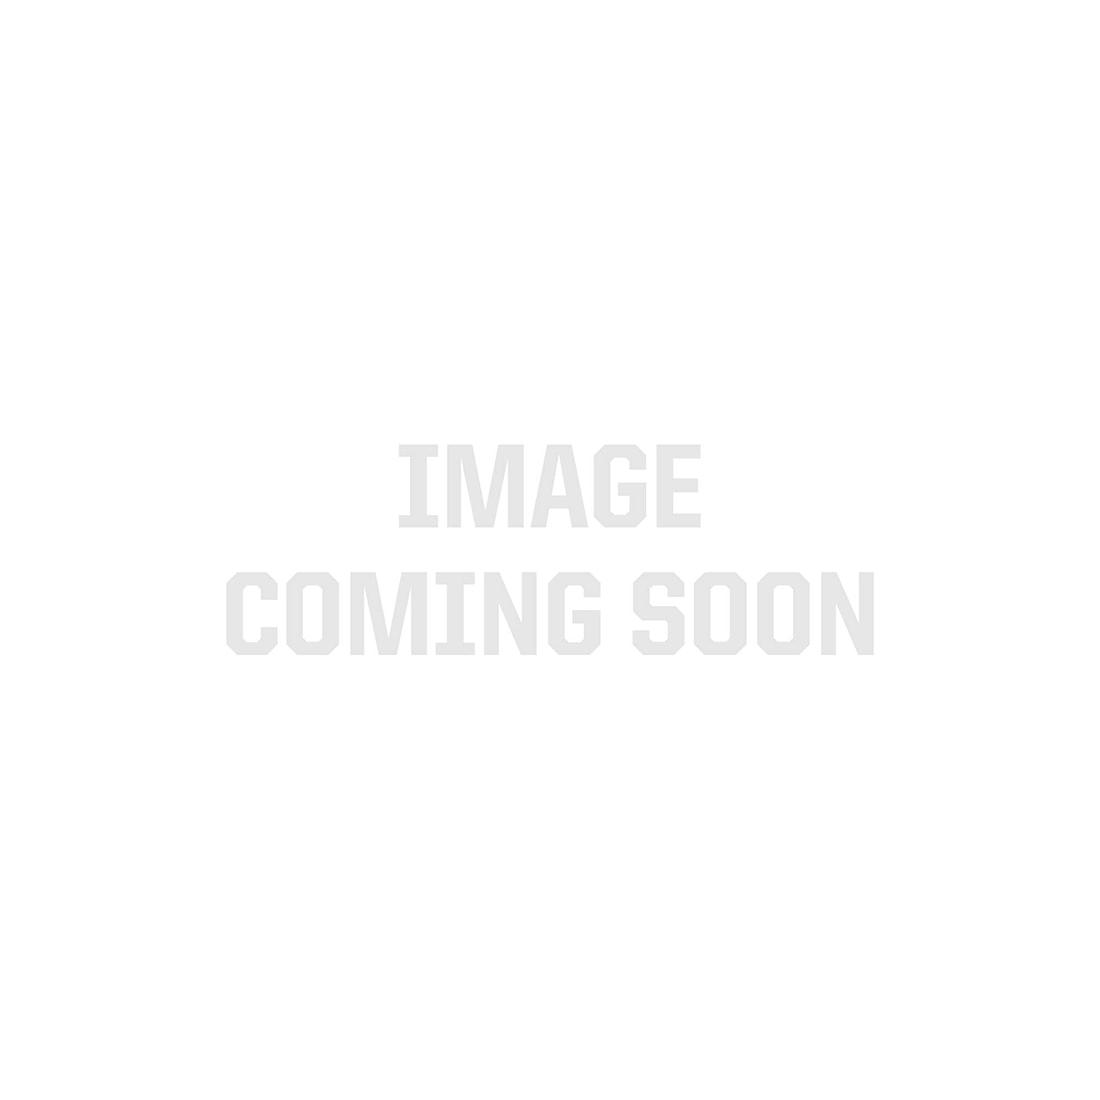 LumenMax 2835 LED Strip Light - 5,000K - 240/m - CurrentControl - 2m Reel